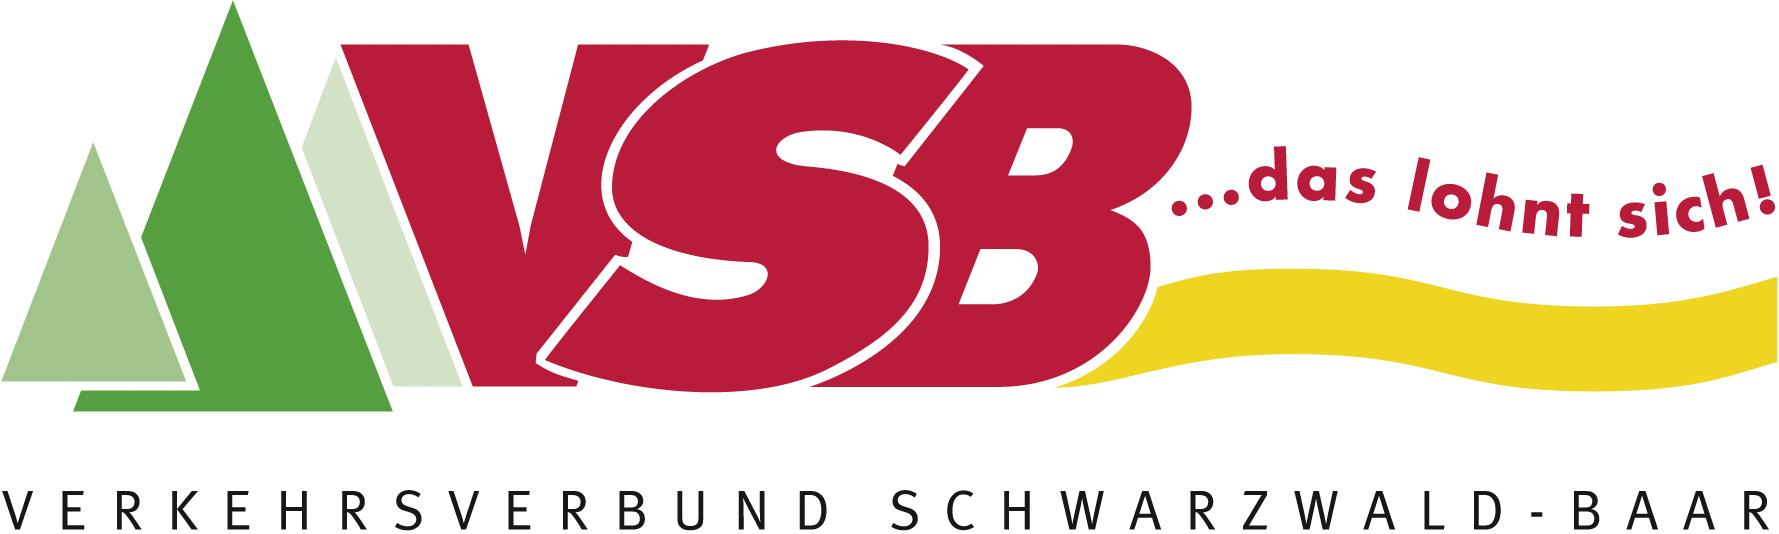 VSB - Verkehrsverbund Schwarzwald-Baar Logo